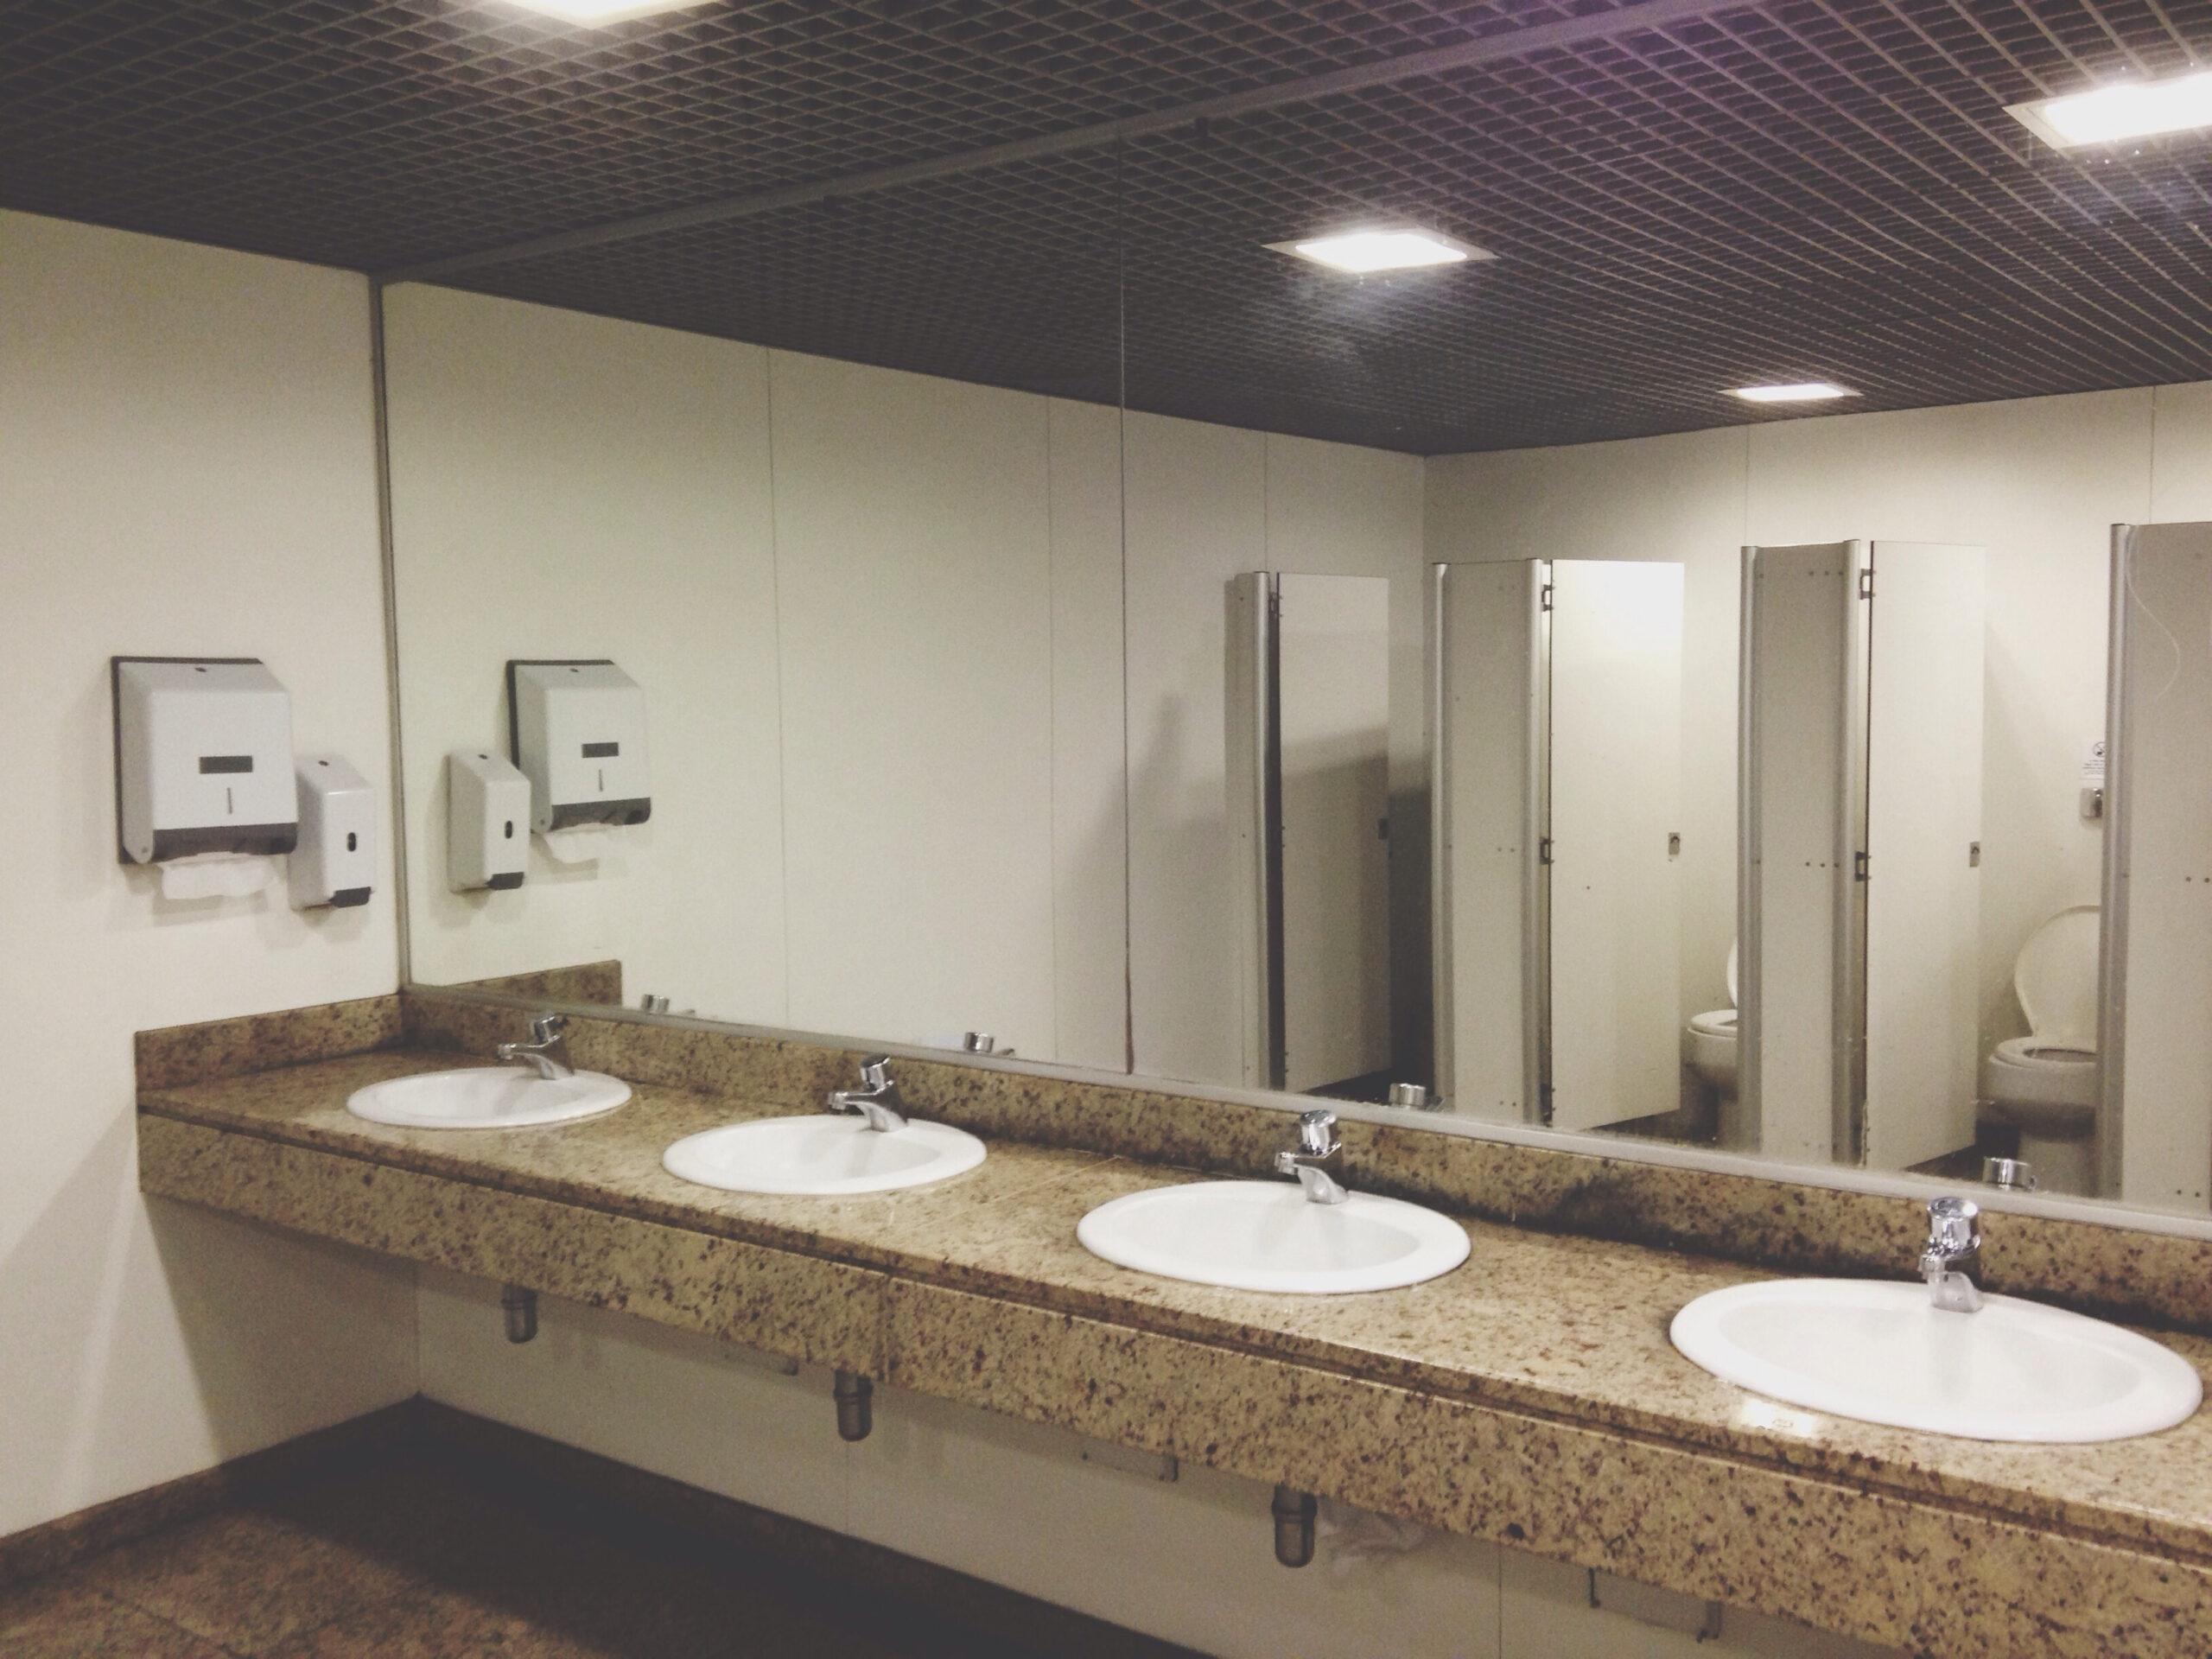 Commercial Bathroom Clog